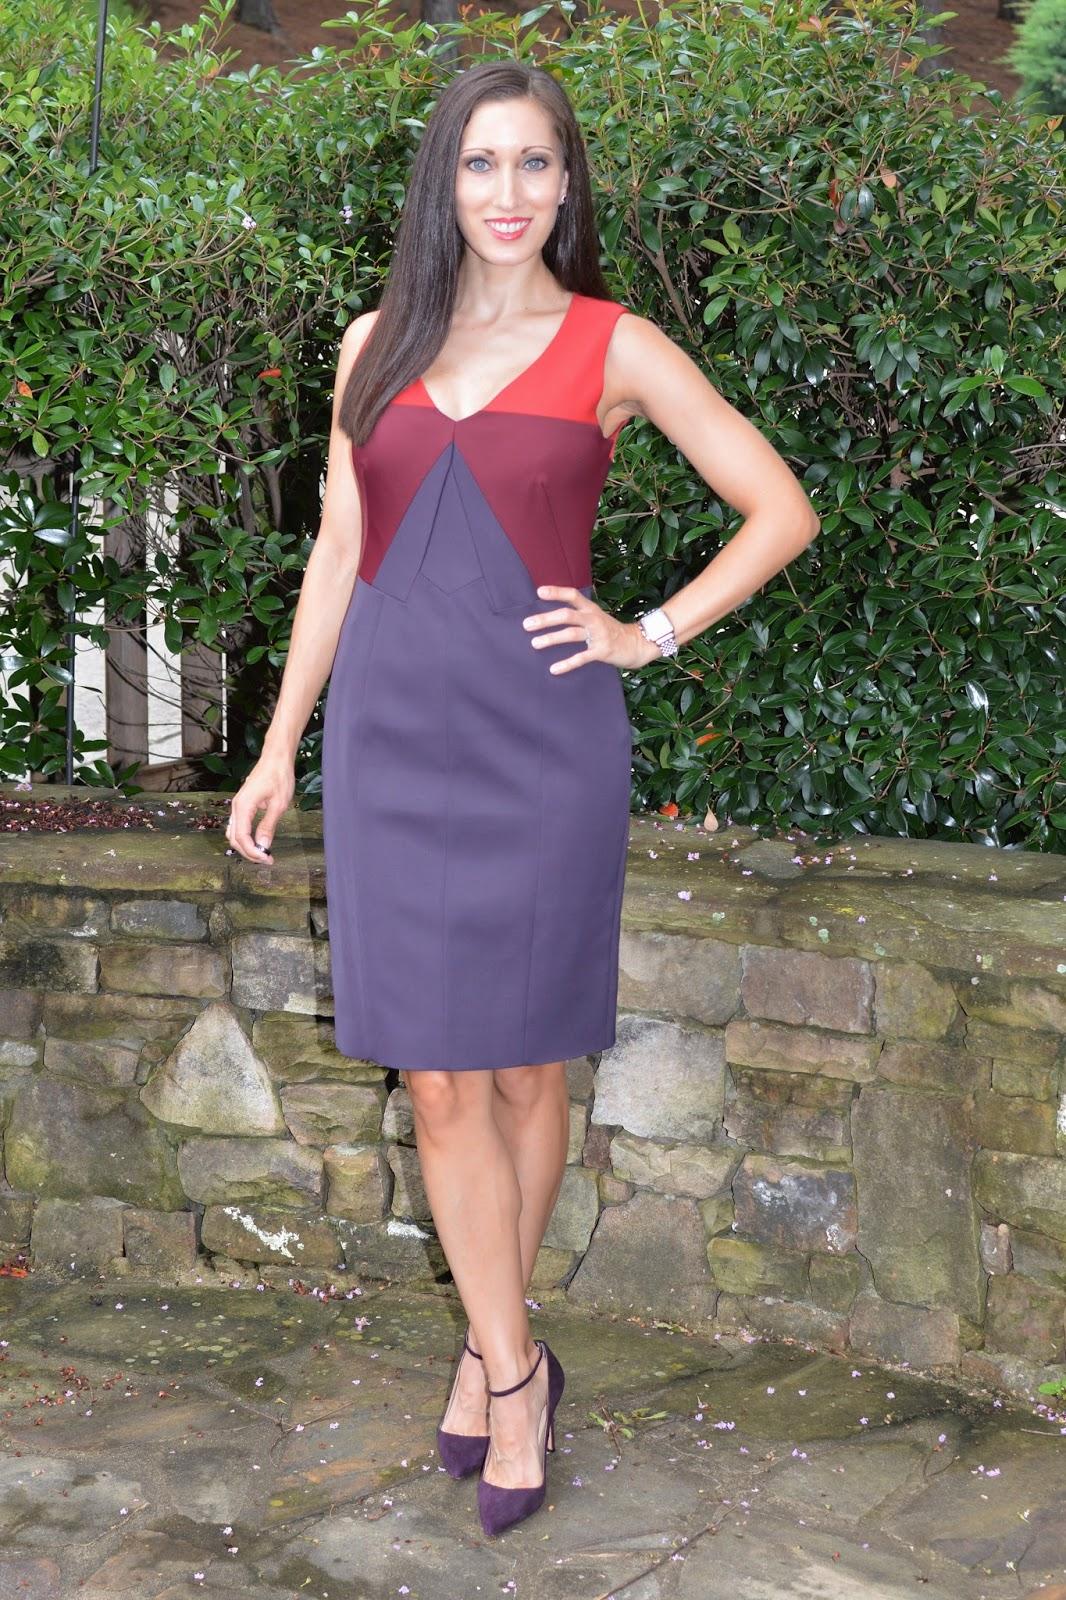 bc746ebf7c4 Everyday Fashionista - Atlanta Blogger: Keeping Touch